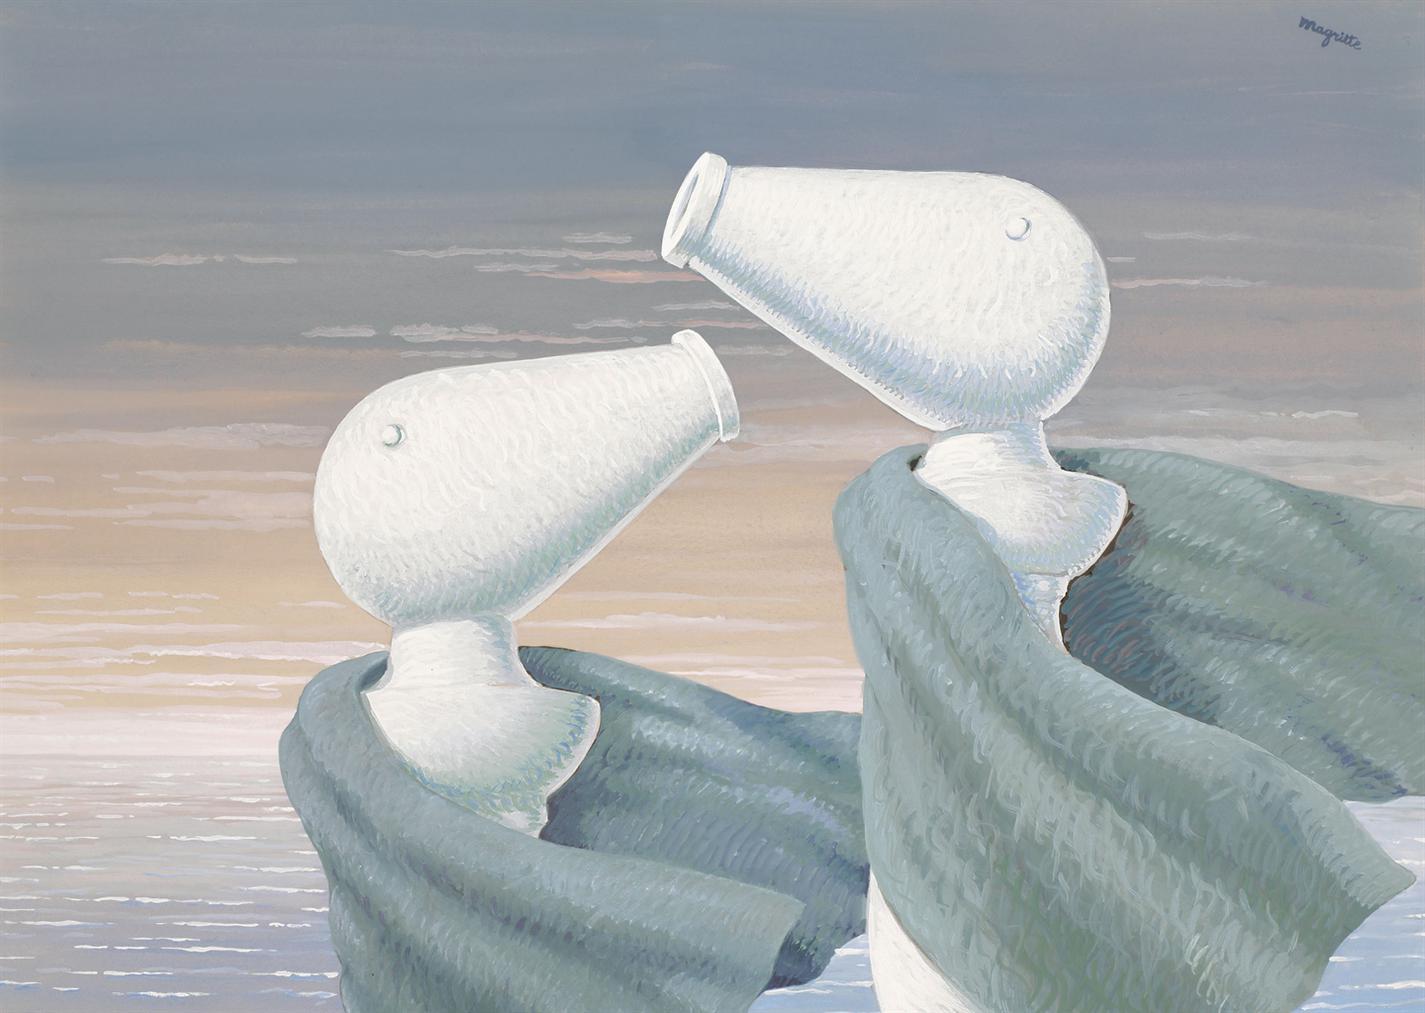 Rene Magritte-Le Colloque Sentimental-1946